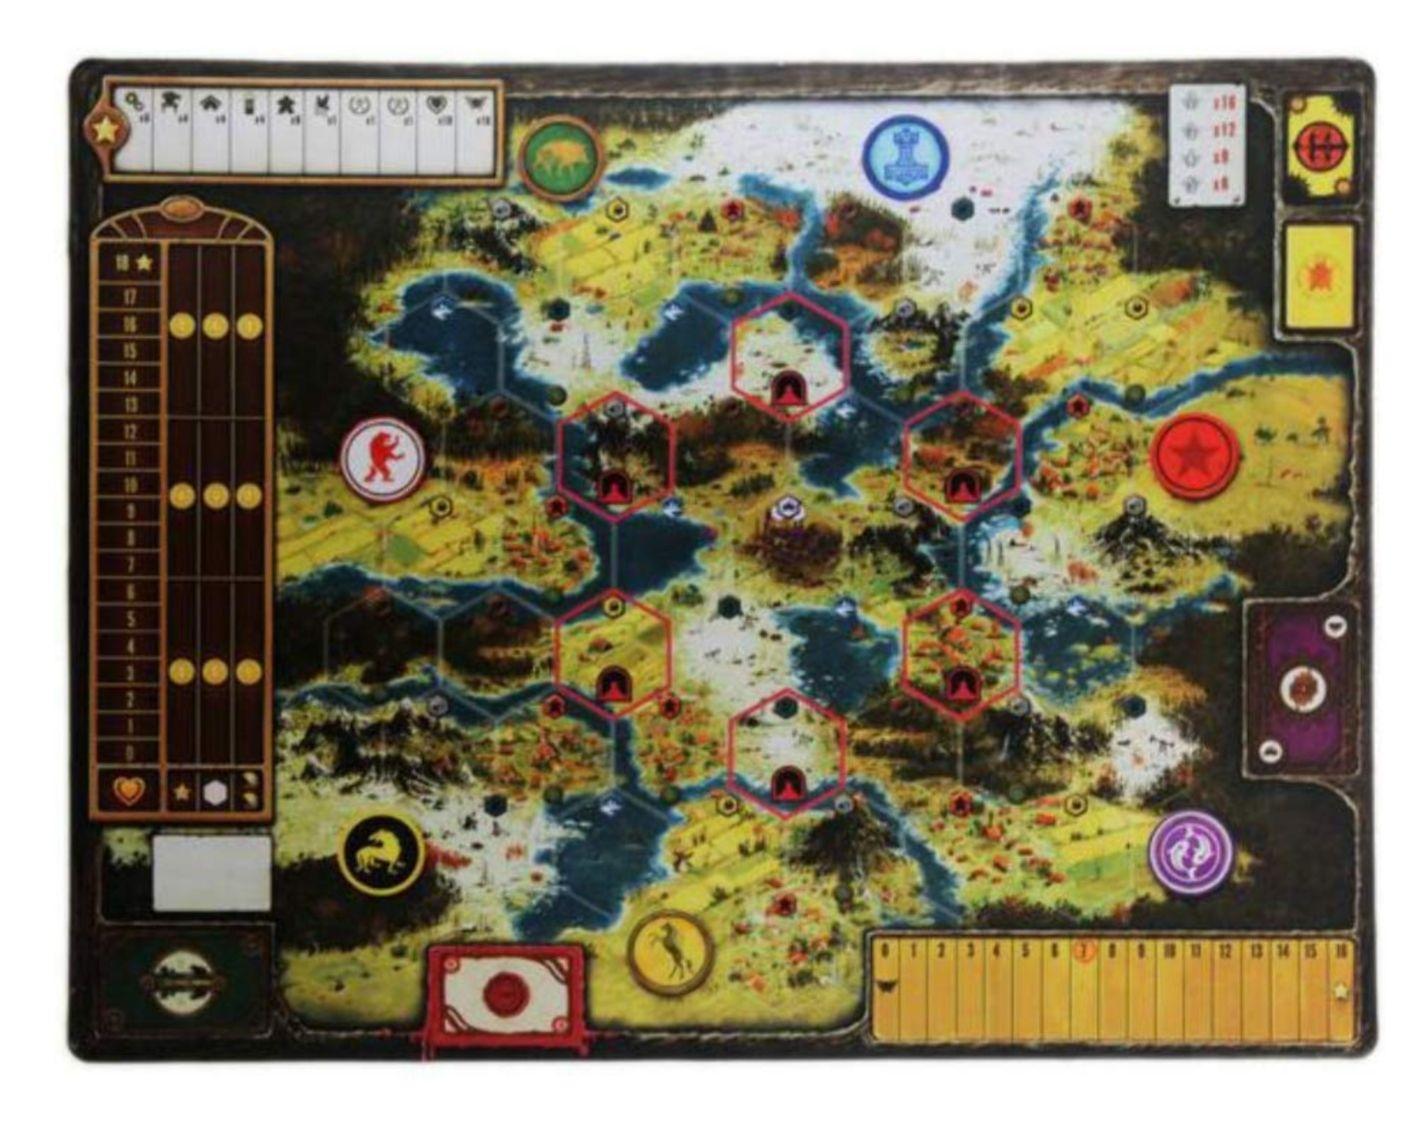 Scythe Neoprene Mat Board Game - Stonemaier Games (Expansion) back image (back cover, second image)